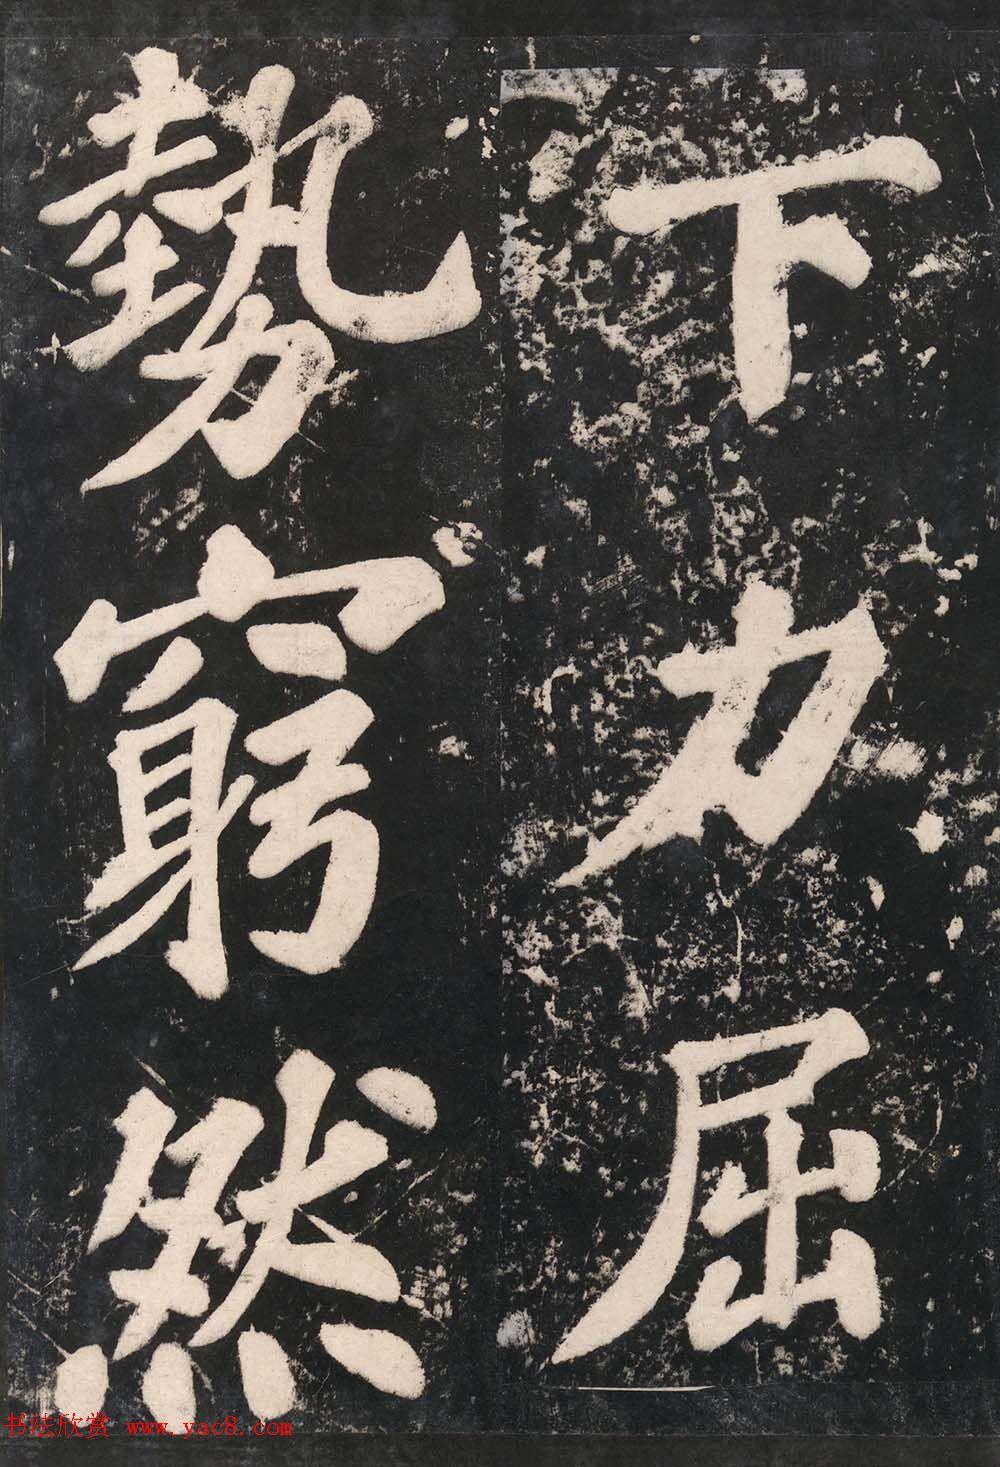 鑻忎笢鍧?3宀佸ぇ瀛楁シ涔︺€婅〃蹇犺纰戝笘銆? border=